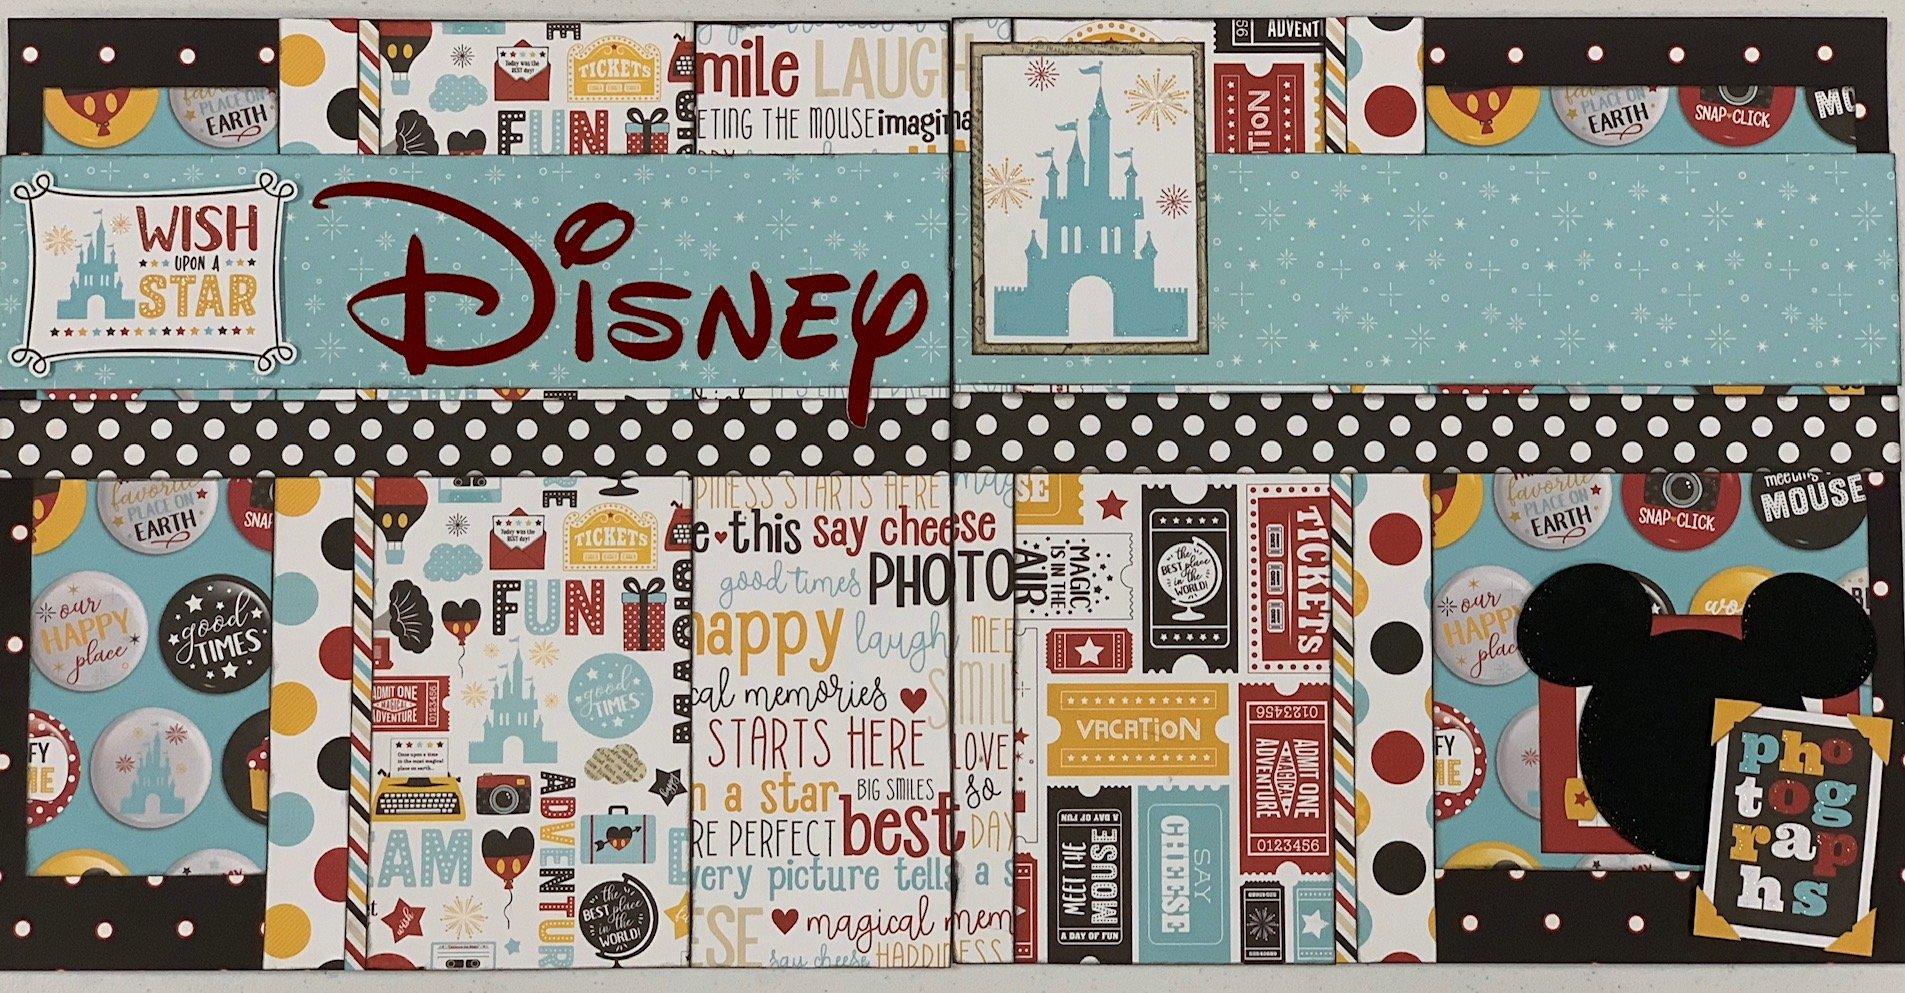 Disney Wish Upon A Star Kit